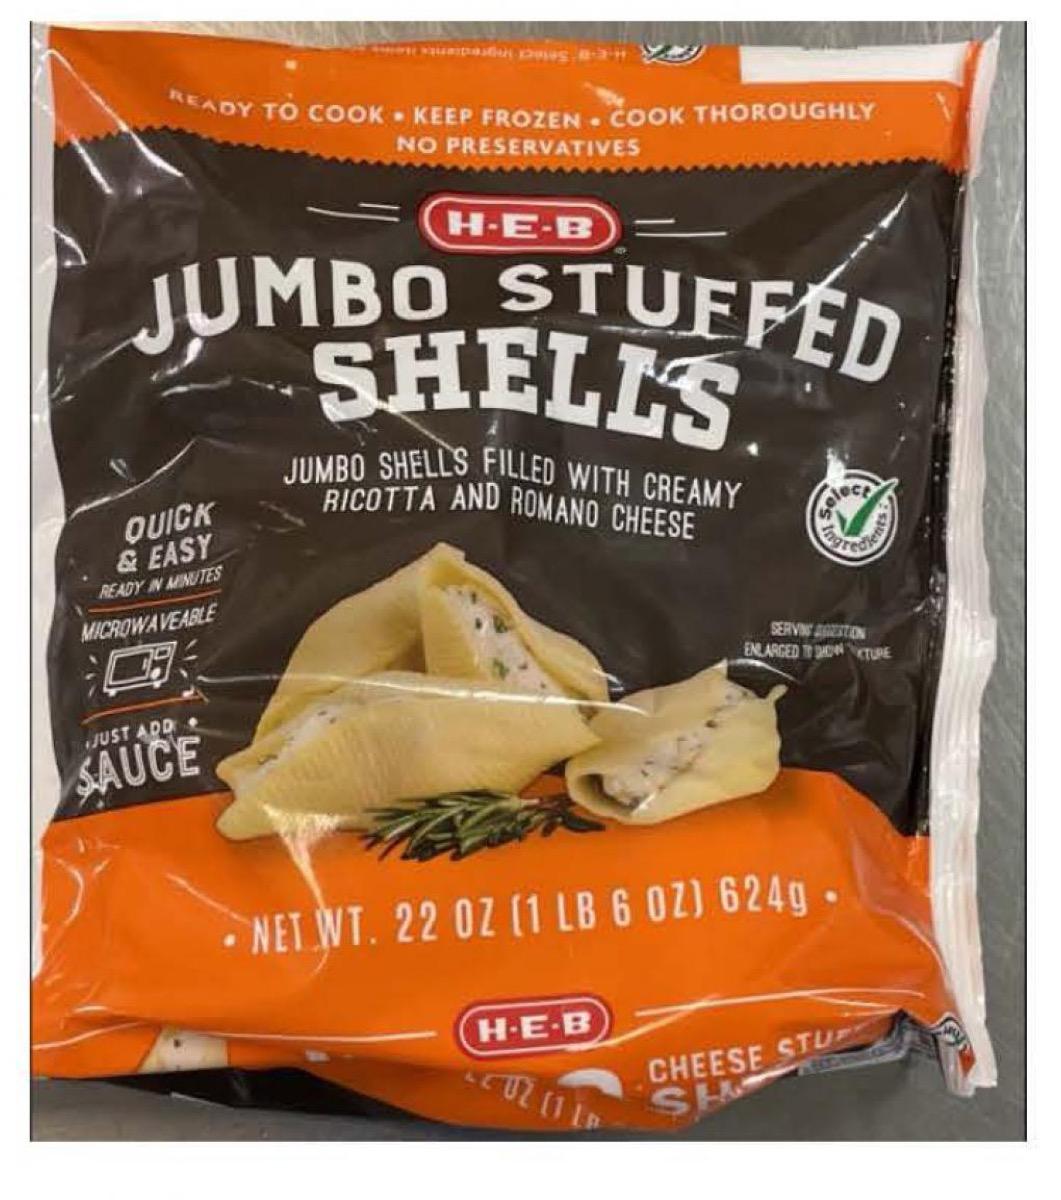 bag of h-e-b frozen stuffed shells